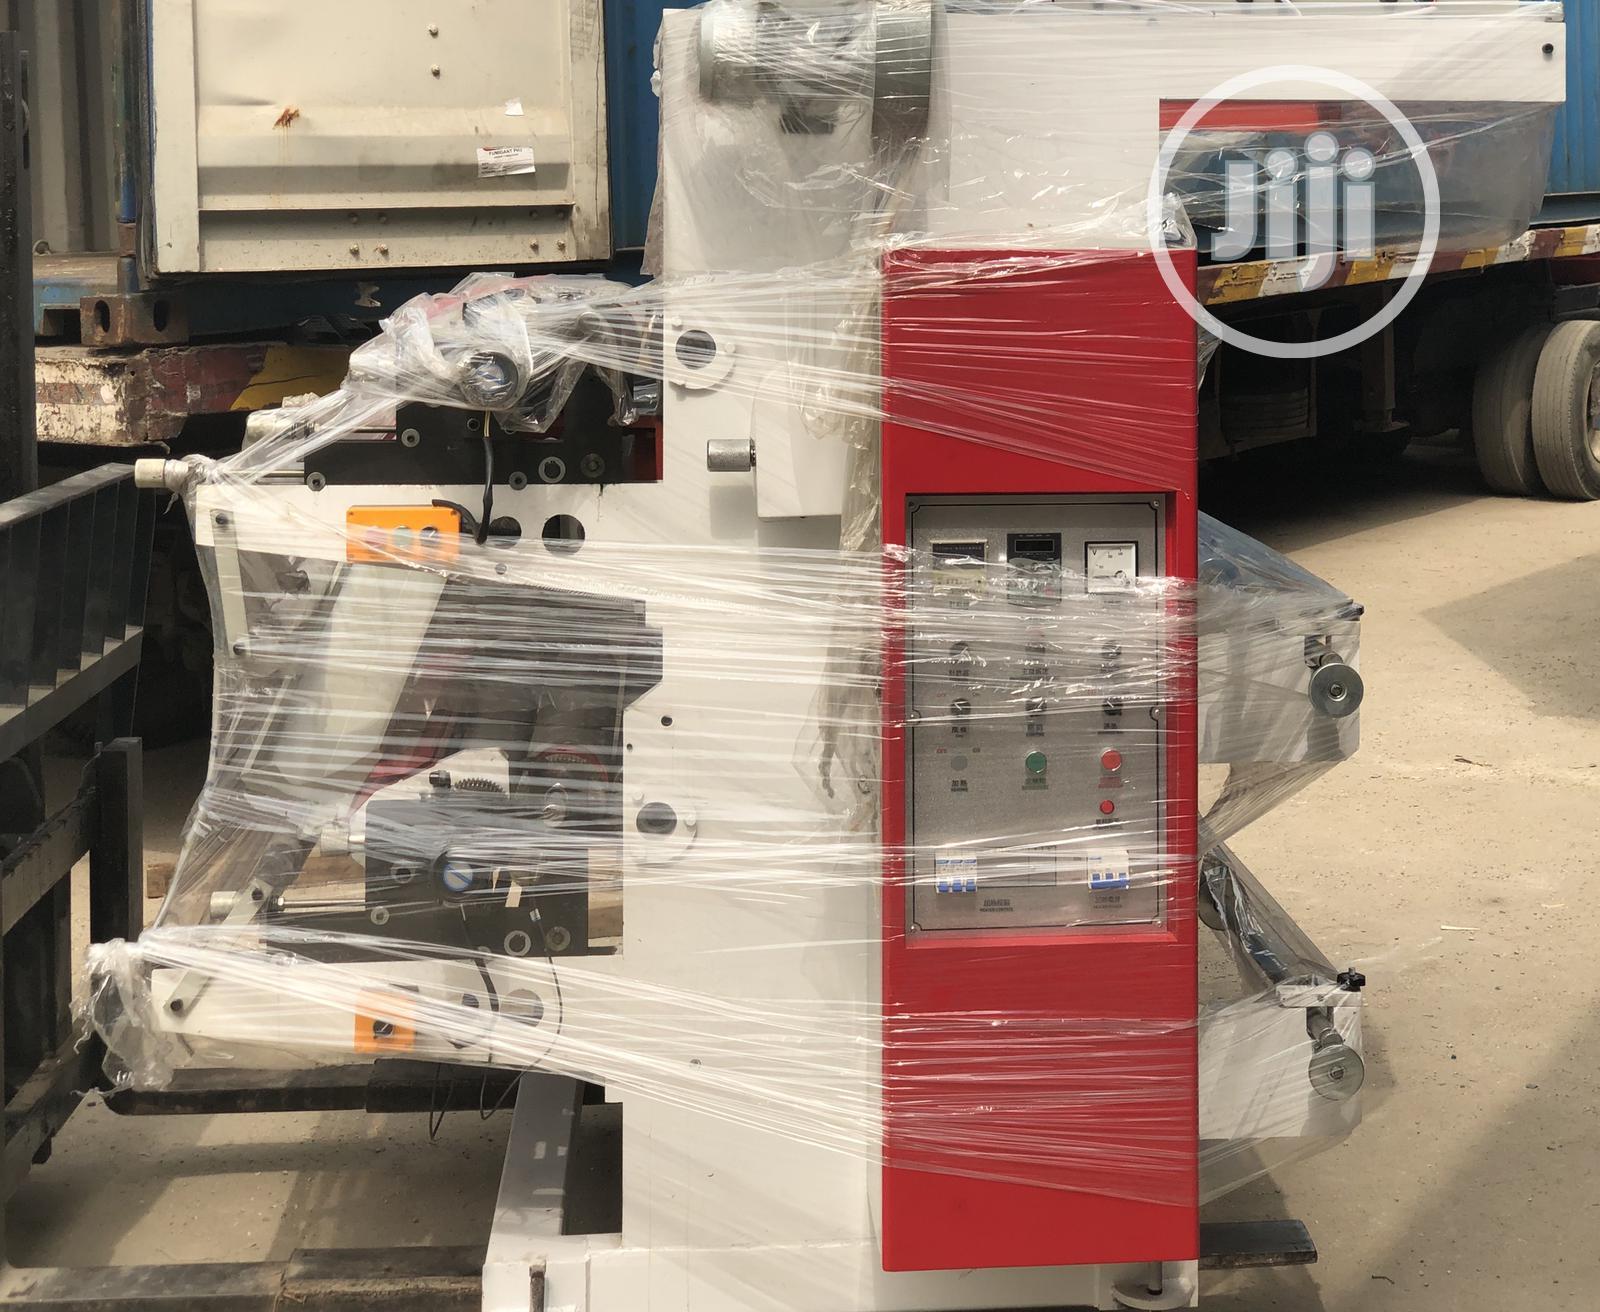 Flexo Nylon Printing Machine For Nylon Printing | Manufacturing Equipment for sale in Ikeja, Lagos State, Nigeria